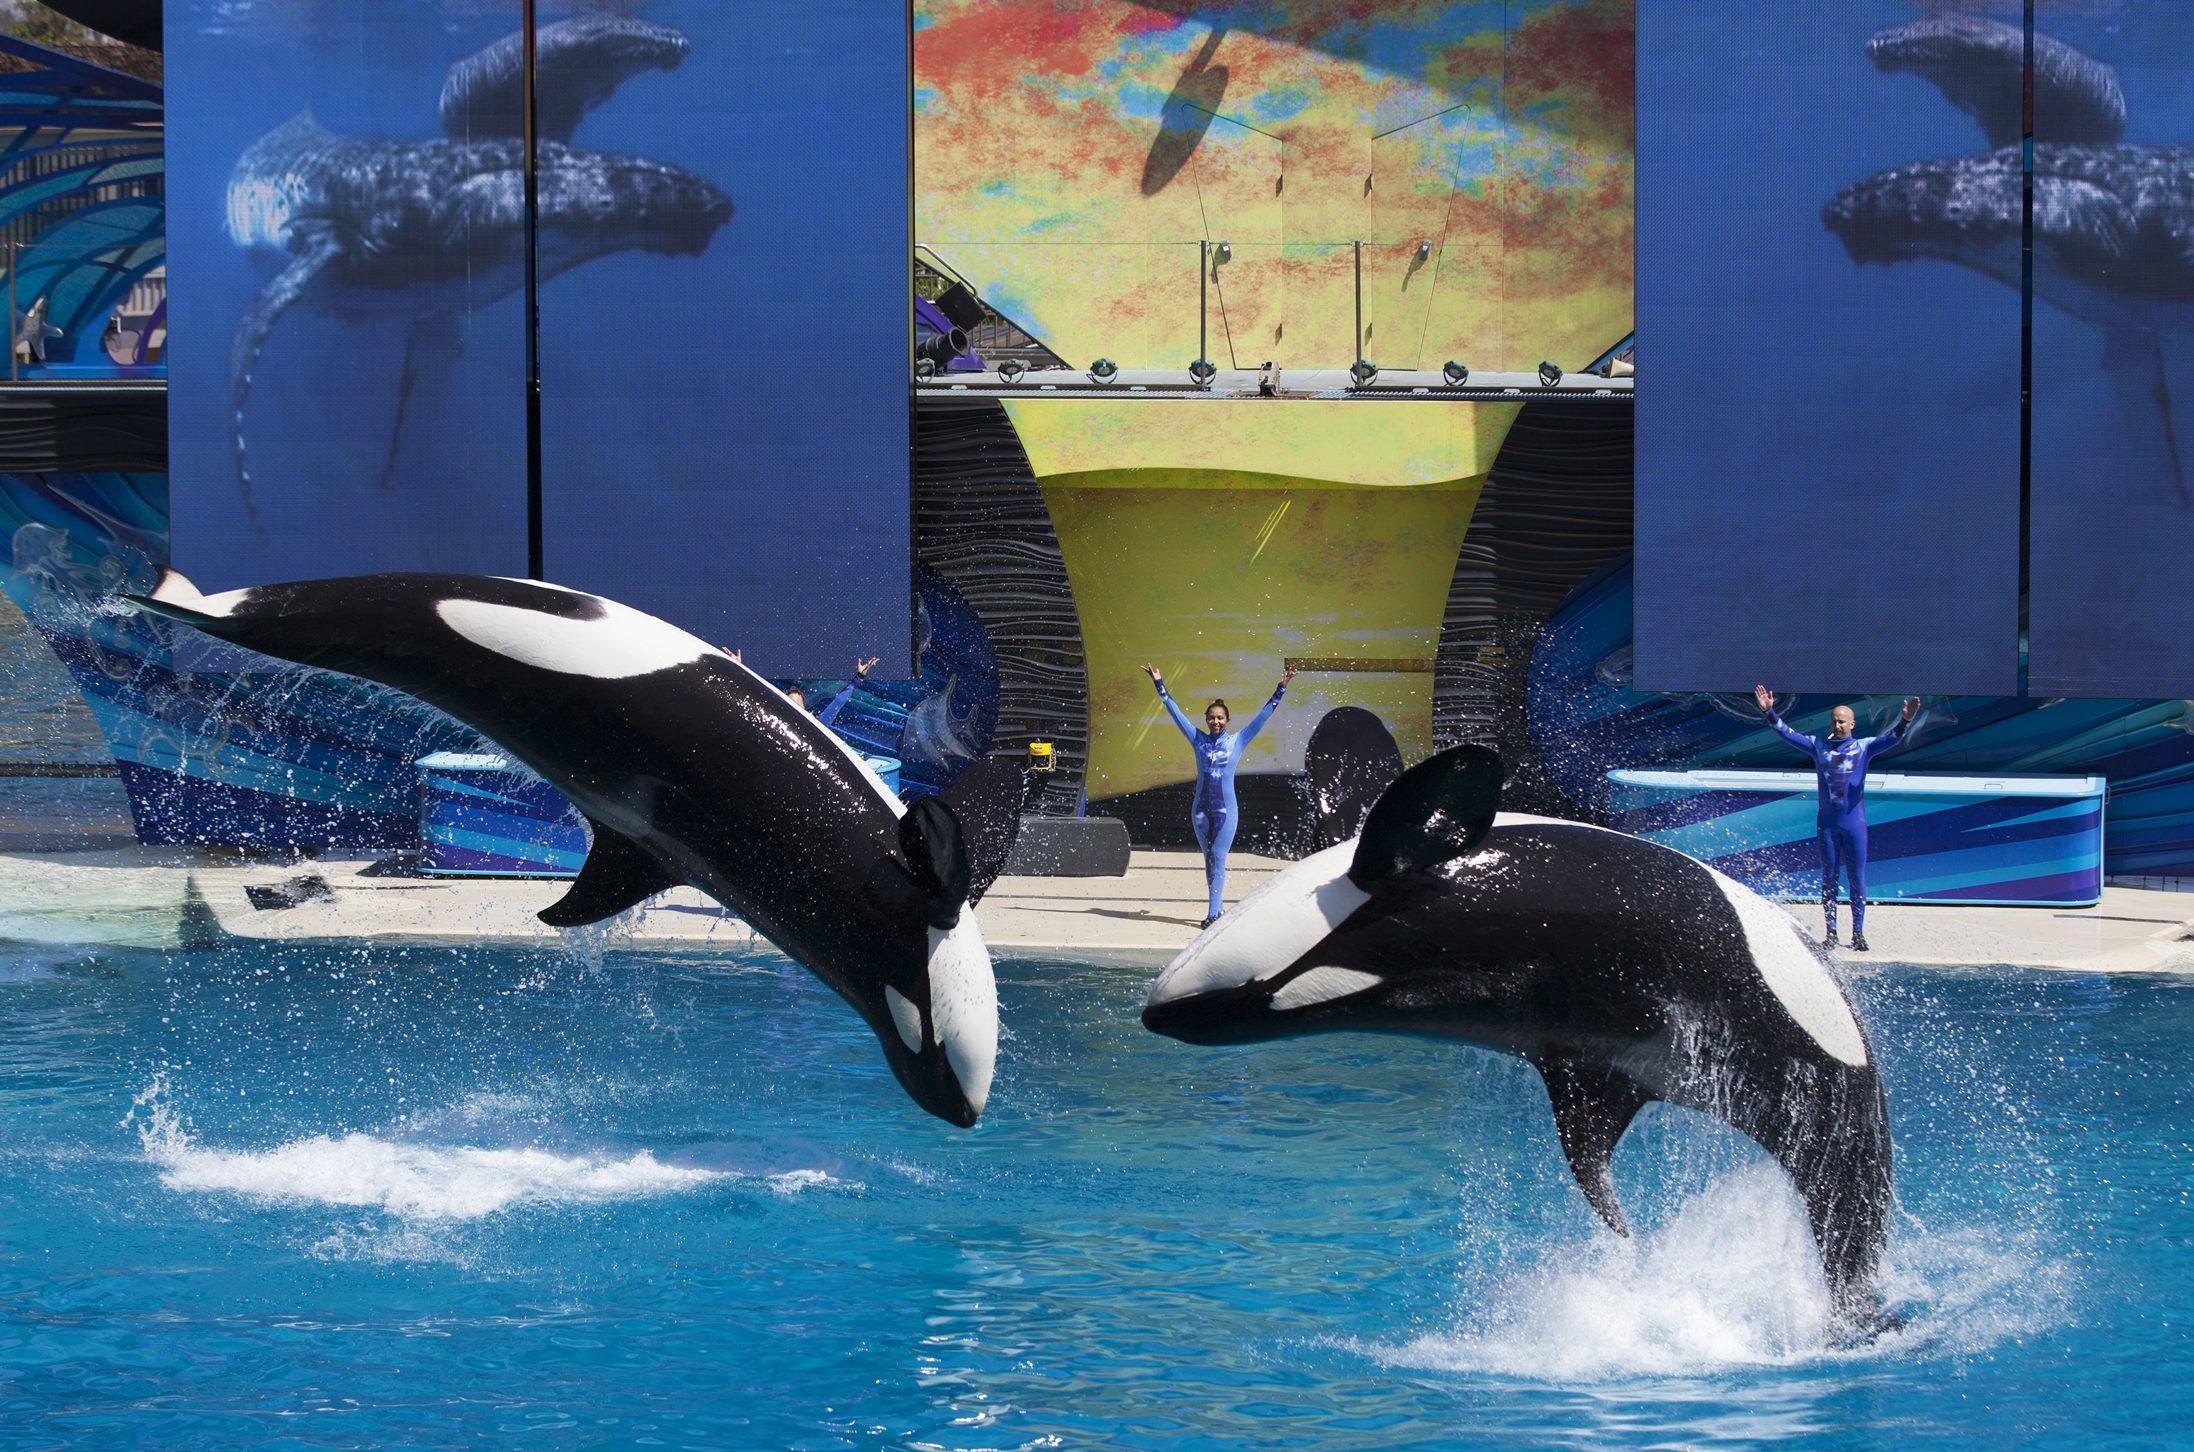 SeaWorld orcas killer whales